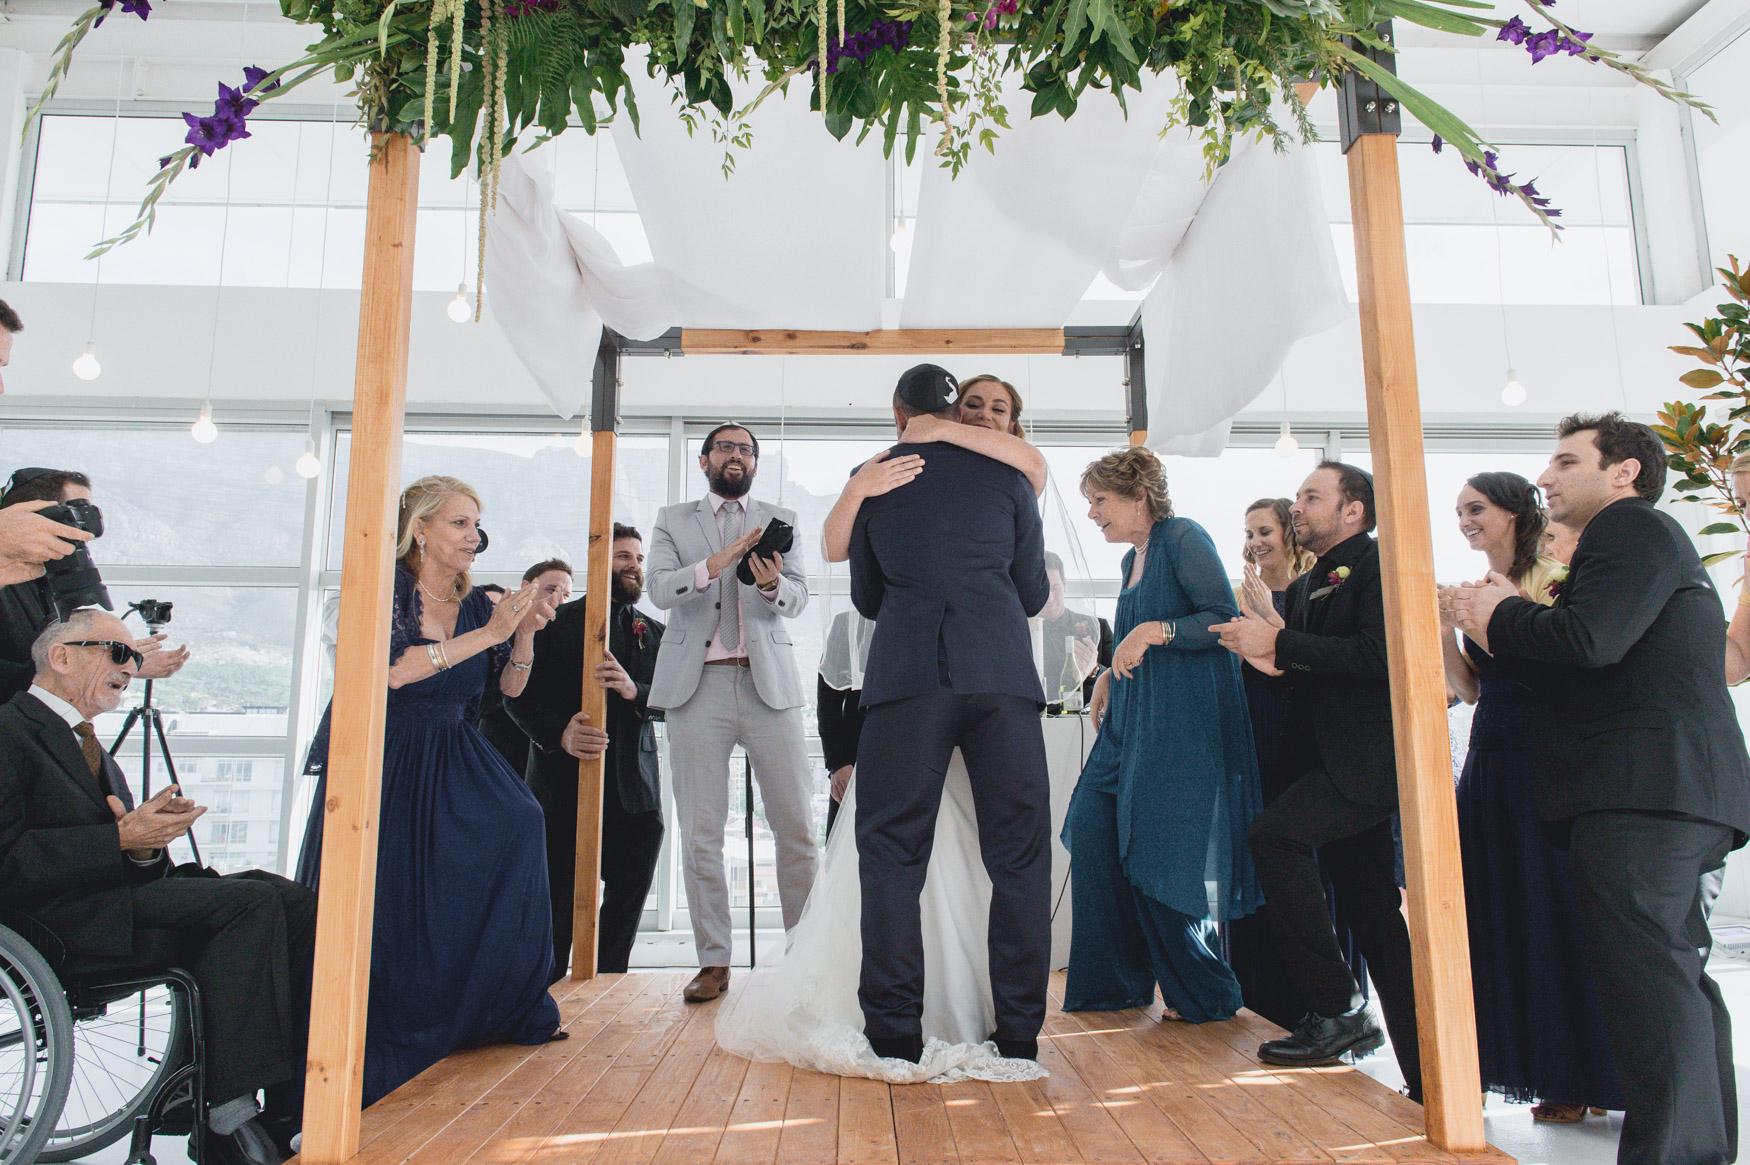 john-henry-wedding-photographer-mike-louise-001-10.jpg